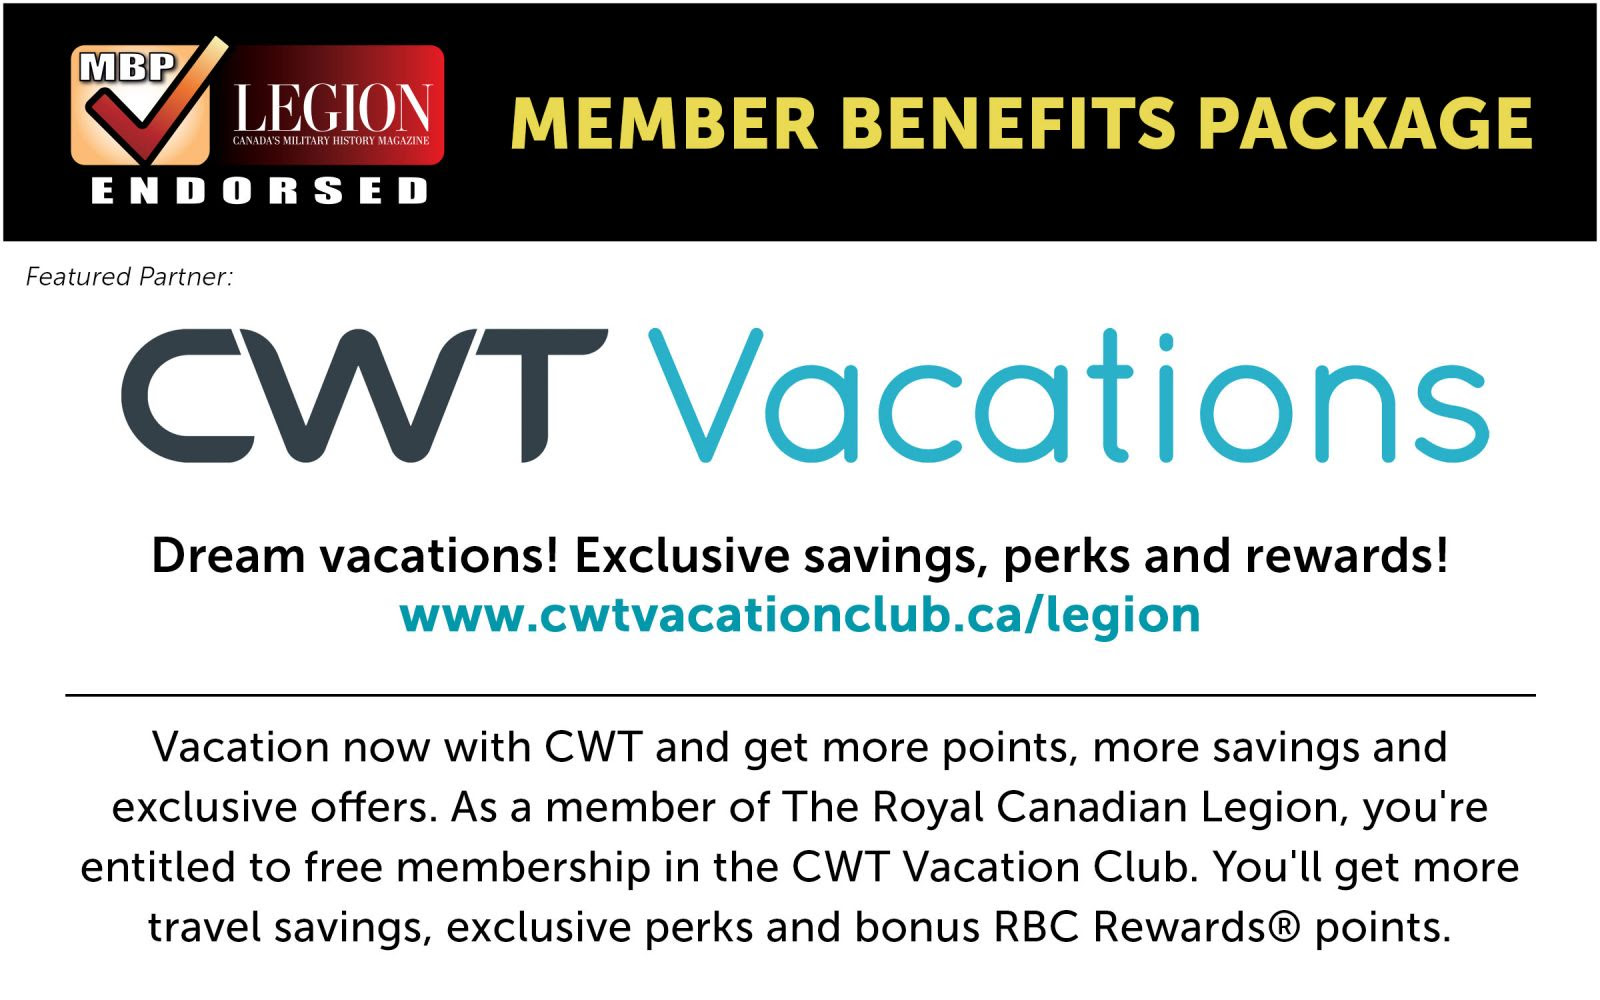 CWT Vacation Club